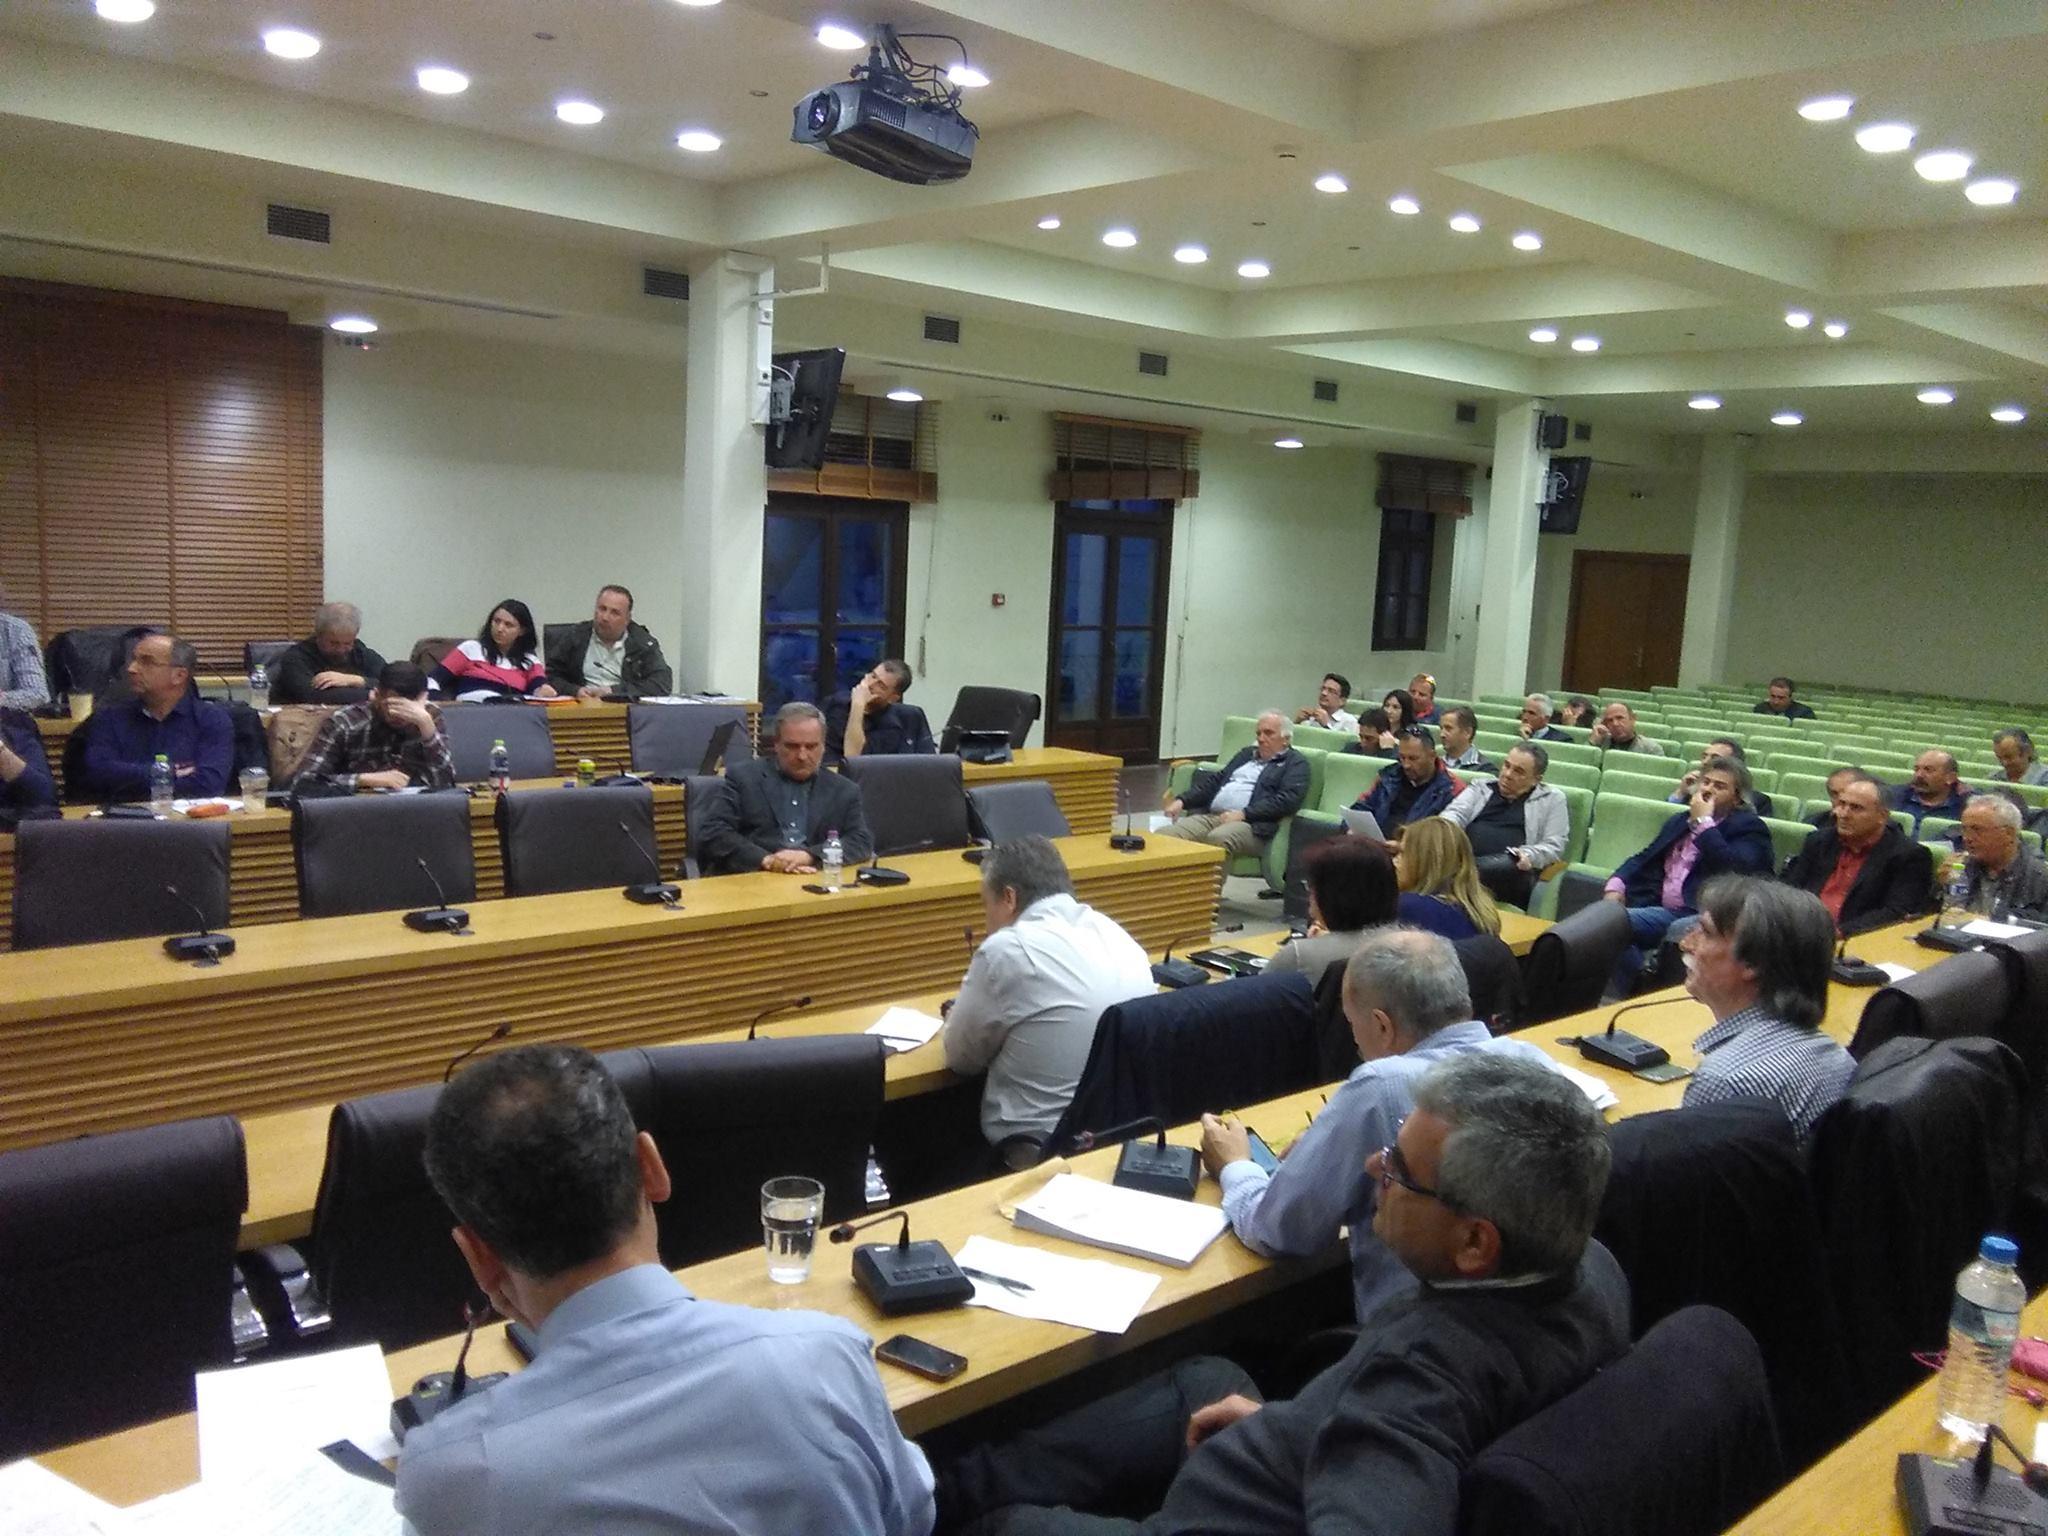 kozan.gr: Δημοτικό Συμβούλιο Κοζάνης: Με τα πιο «μελανά» χρώματα περιέγραψαν οι εκπρόσωποι των Ενεργειακών Σωματείων της περιοχής το τι σημαίνει ιδιωτικοποίηση και πώληση Μονάδων (Βίντεο)